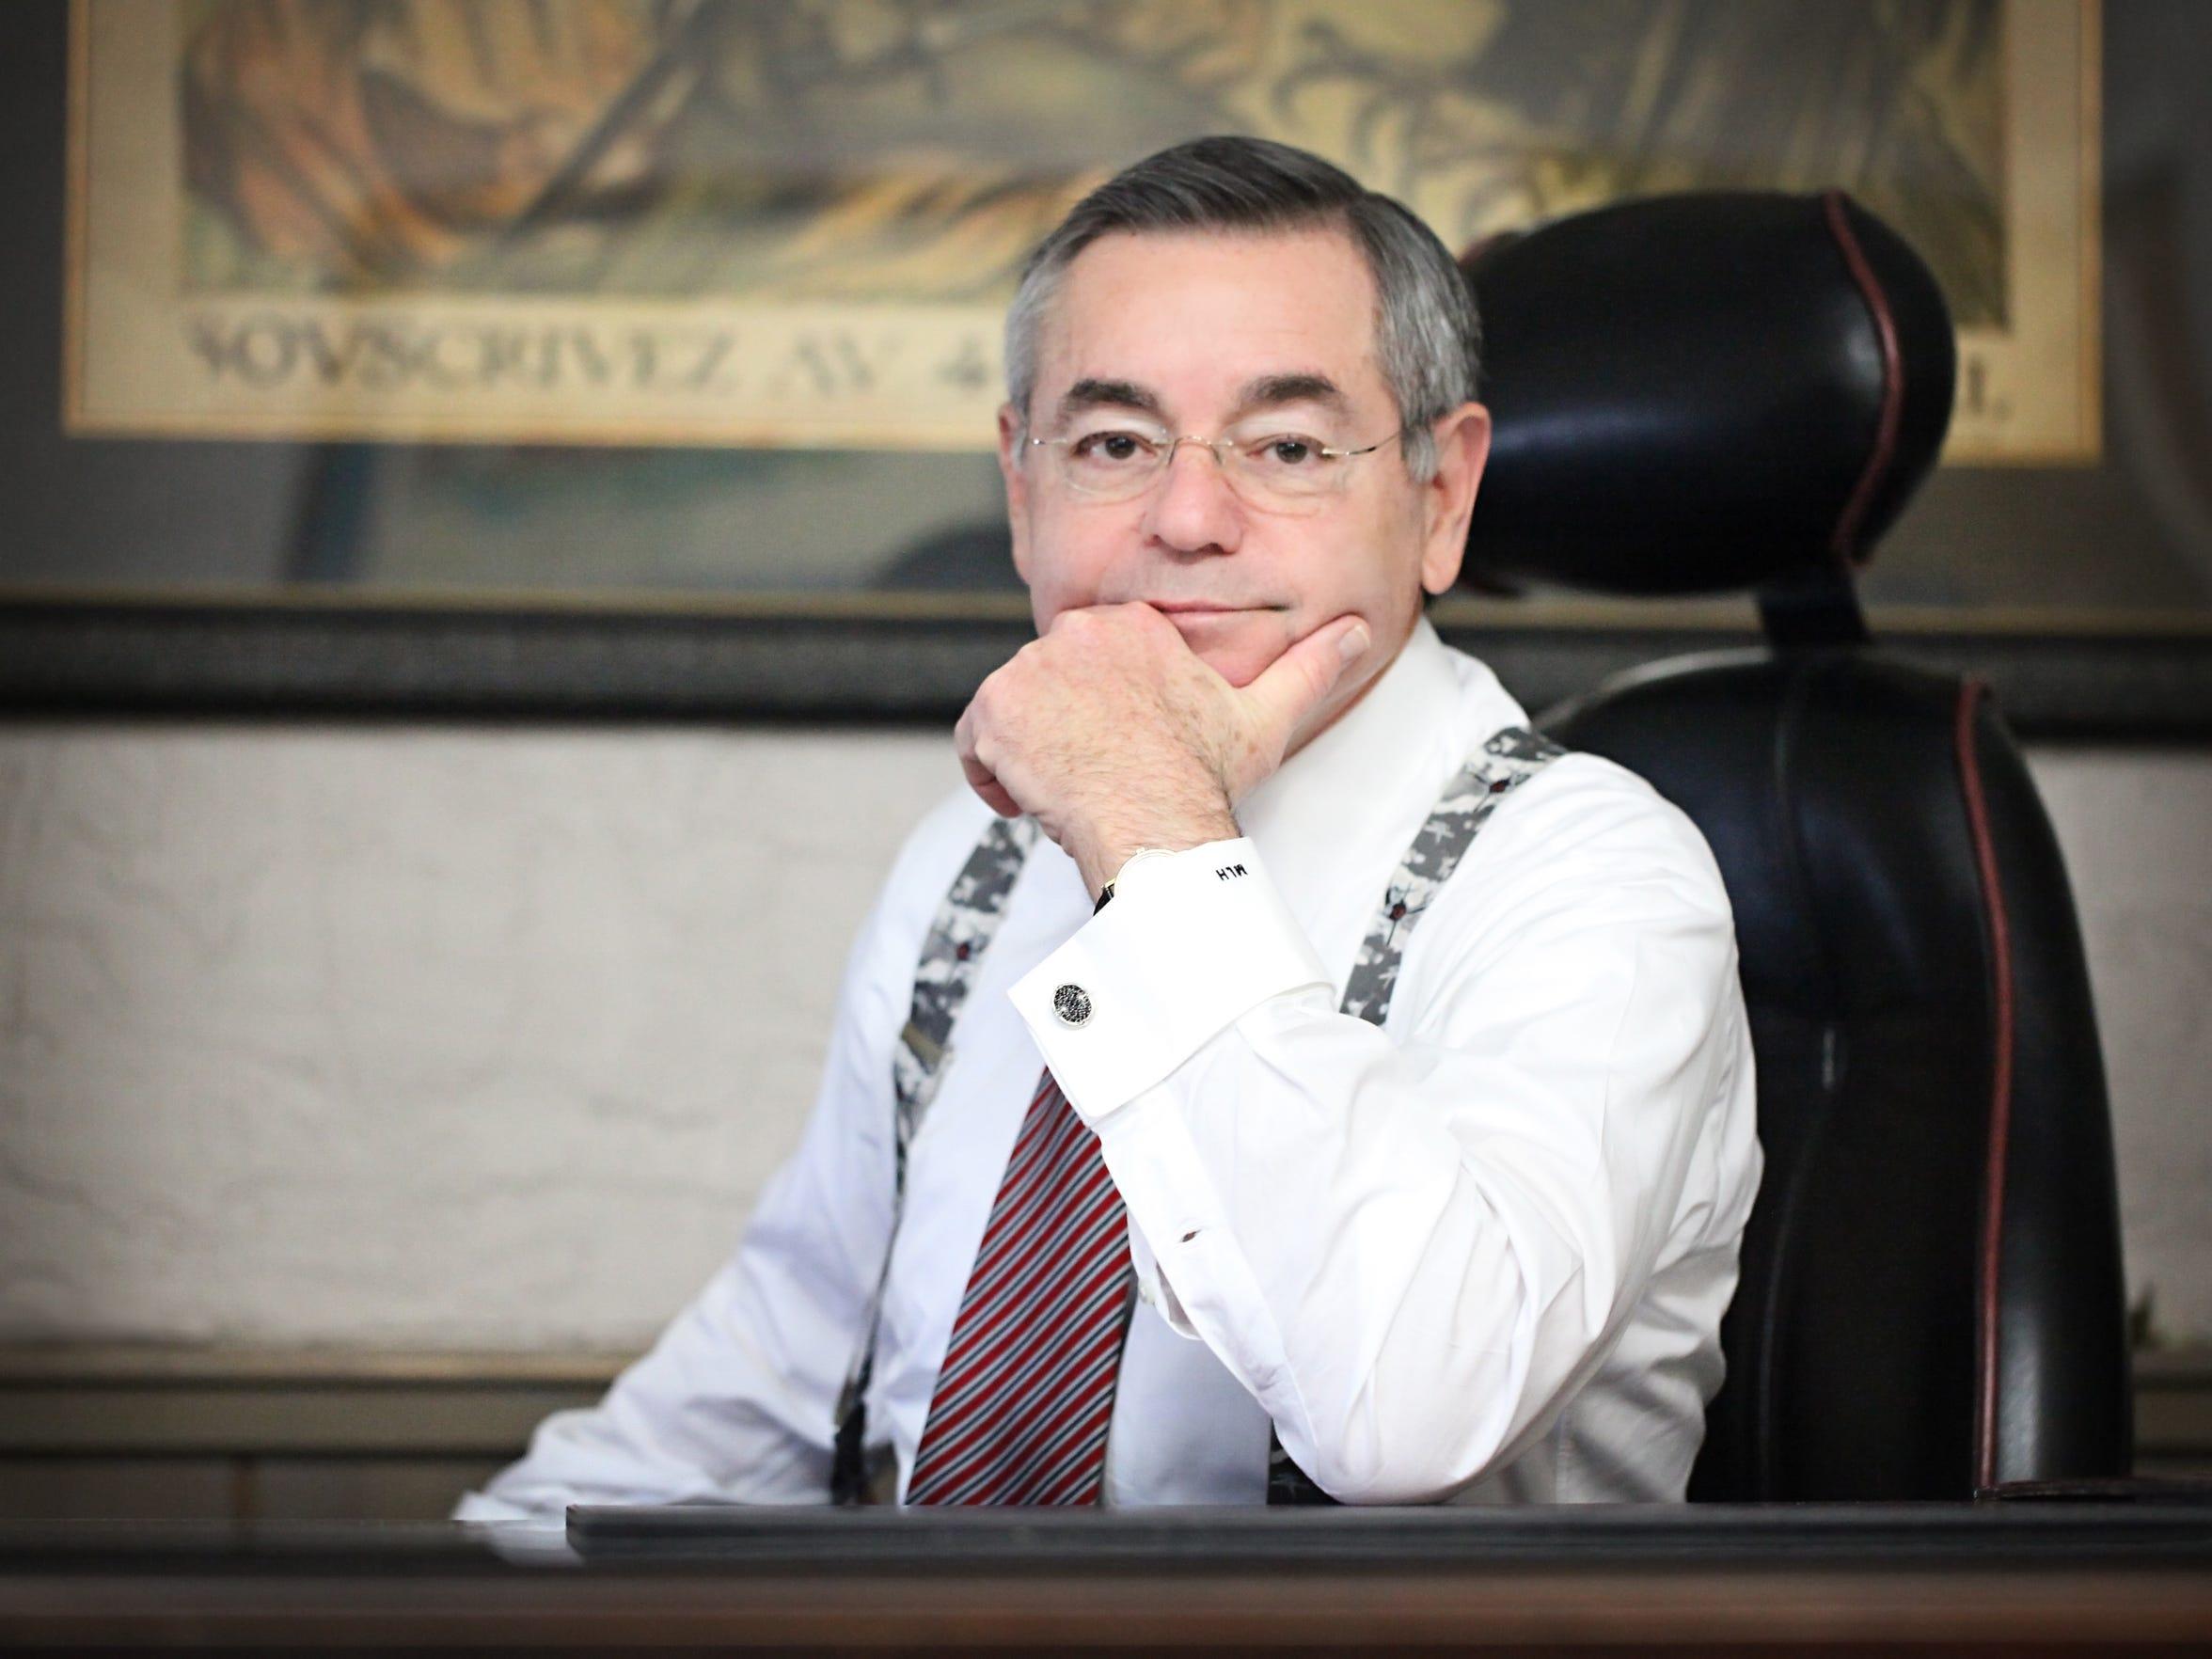 Attorney Mark Horwitz represented Wilton dedge during